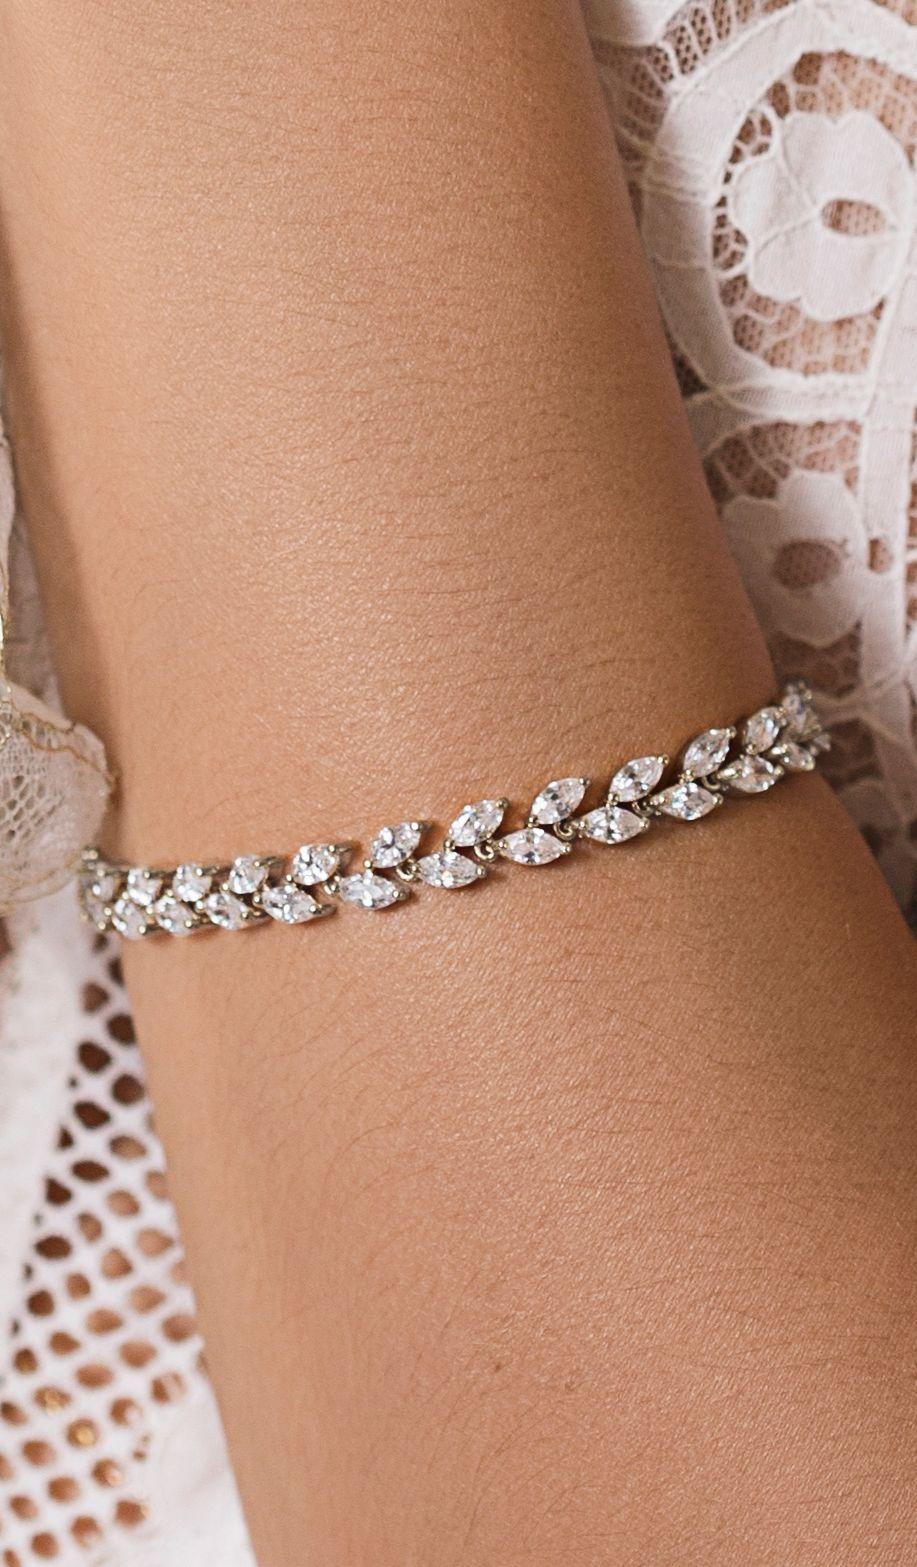 Bracelet Silver Bracelet Wedding Jewelry Brides Crystal Bracelet Bridal Jewelry Leaf Jewelry Bridal Bracelet Gold Leaf Bracelet